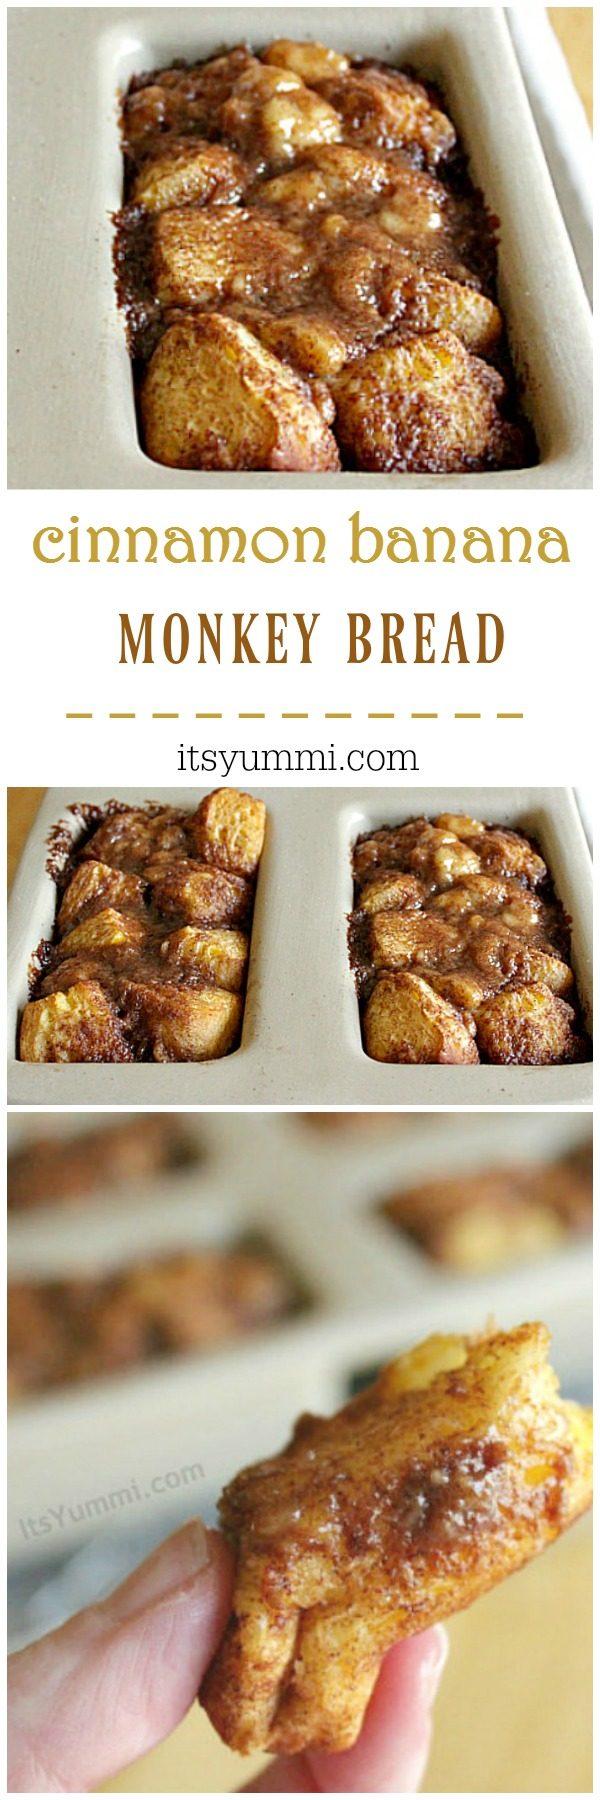 Cinnamon Banana Monkey Bread | recipe on itsyummi.com